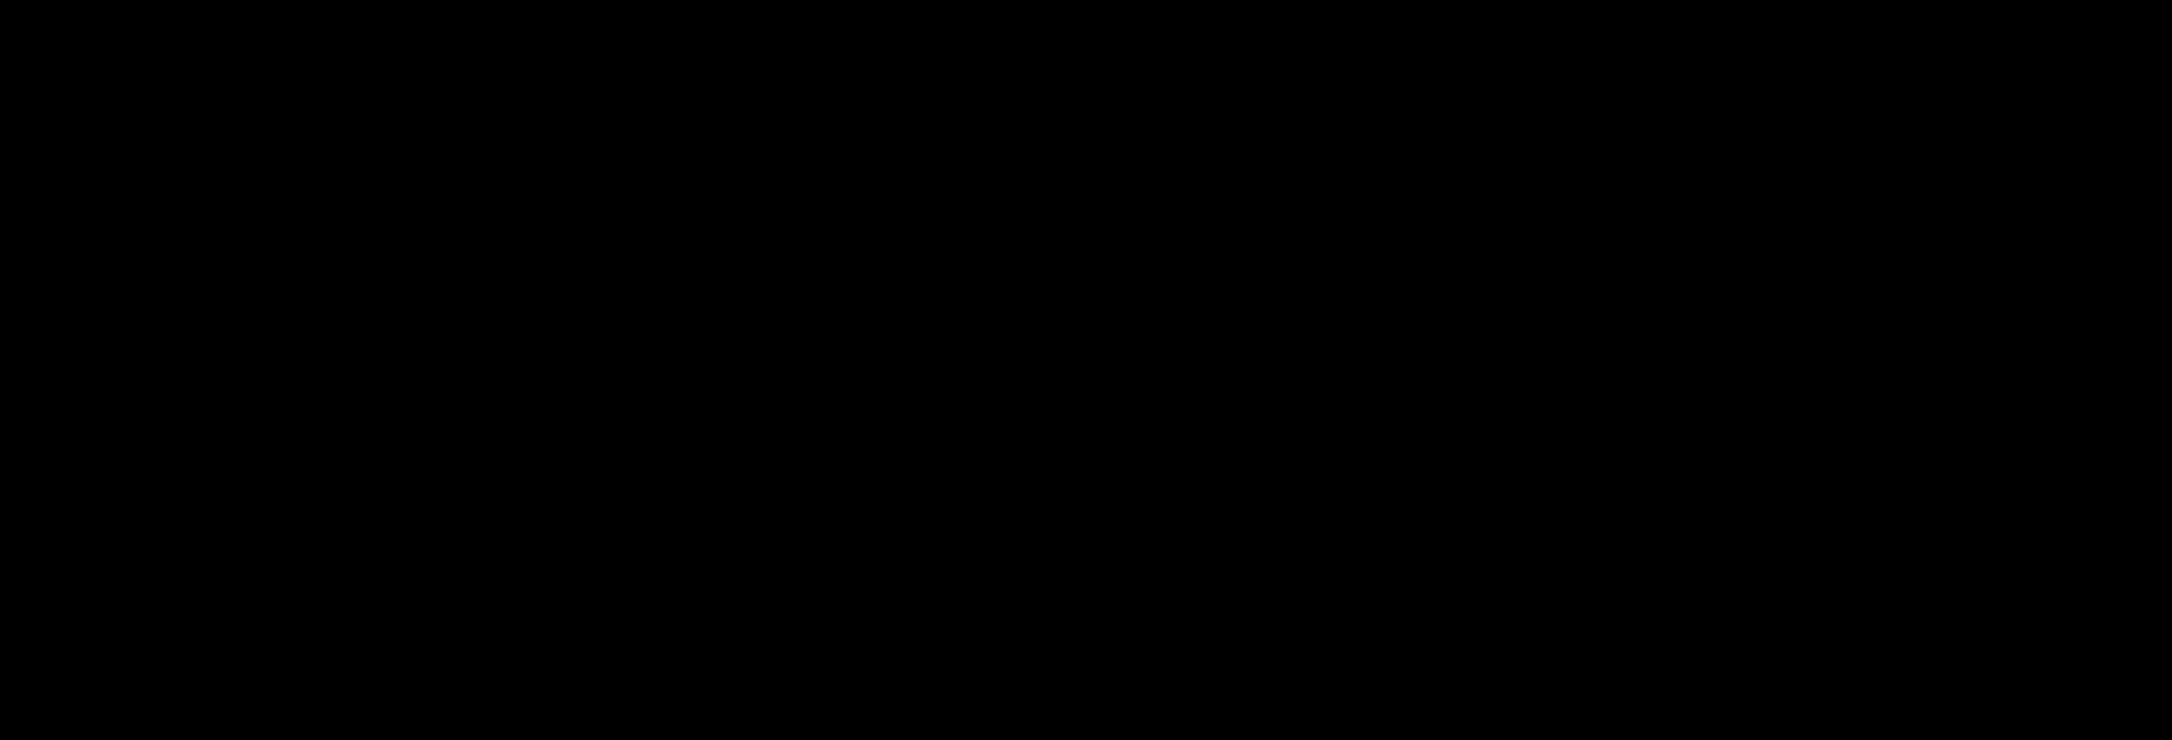 HVWC Logo, HVWC, Harvest Valley, Sandpoint, Idaho